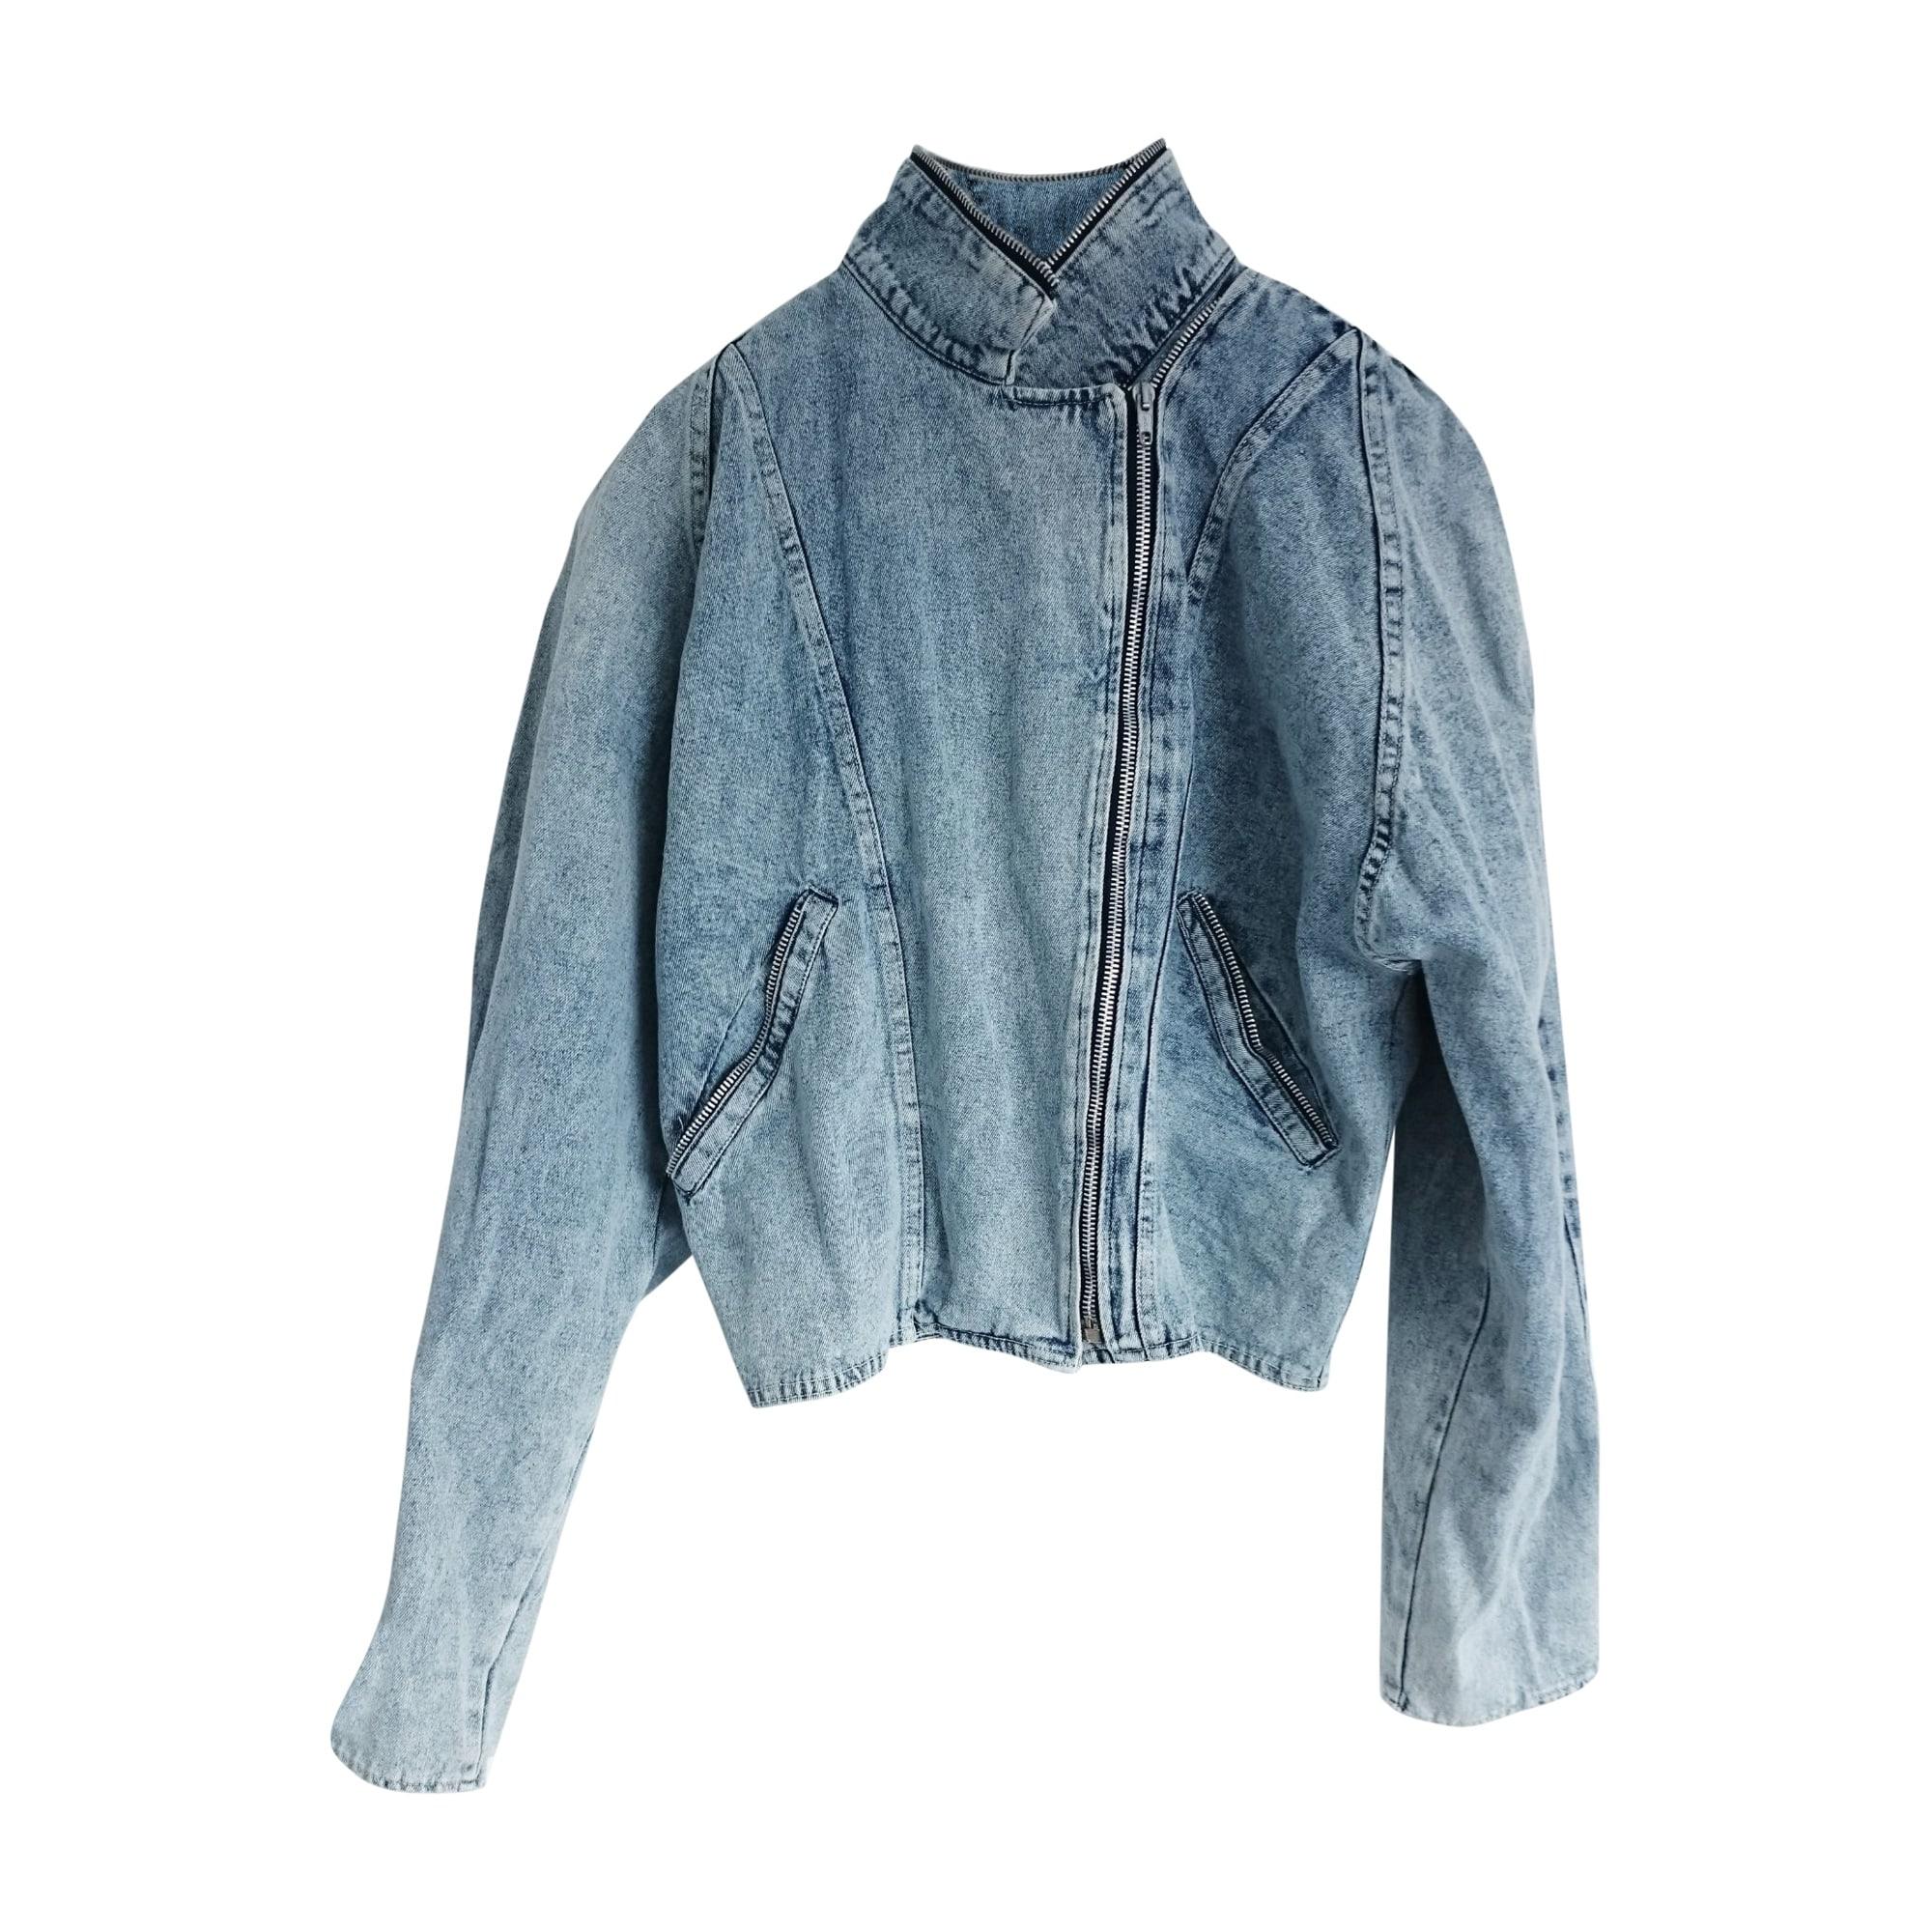 Veste en jean RALPH LAUREN Bleu, bleu marine, bleu turquoise